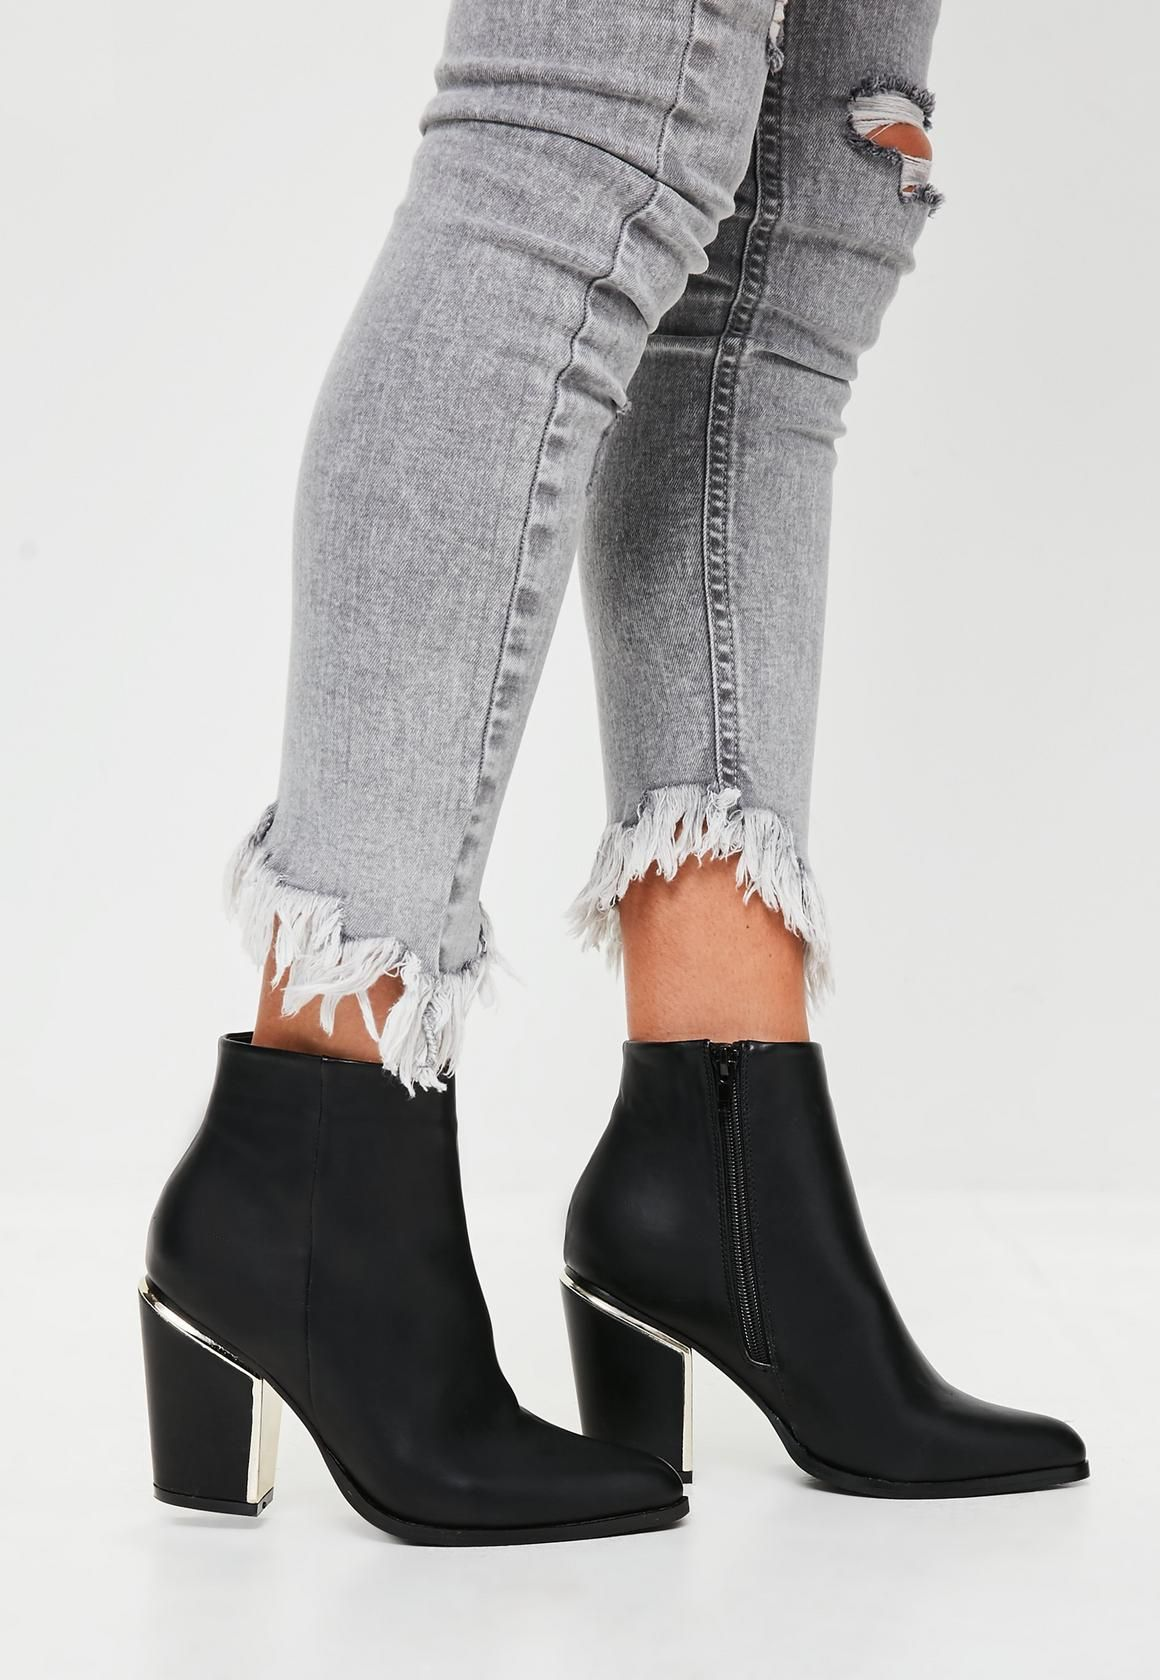 00b1daac6c5 Missguided - Black Gold Trim Block Heeled Boots | threads | Boots ...